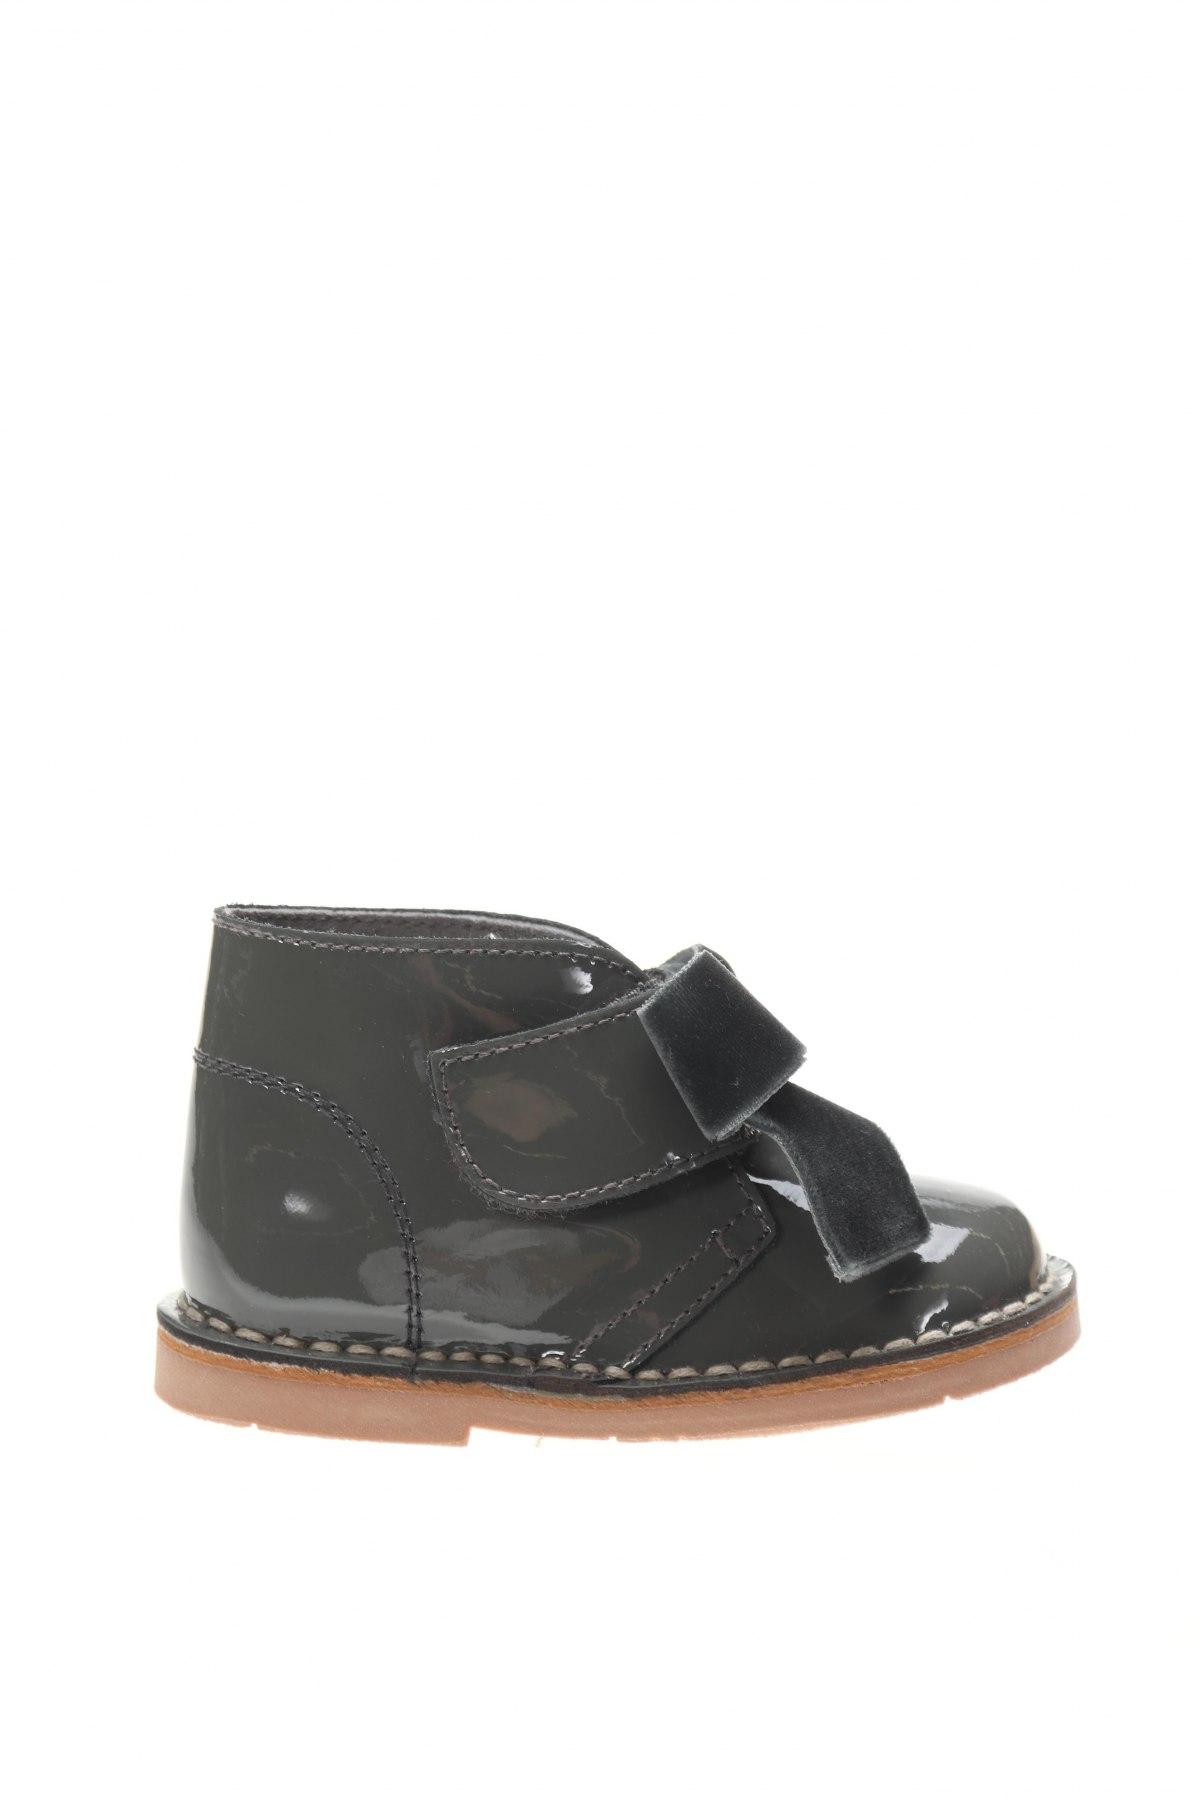 Детски обувки Lola Palacios, Размер 20, Цвят Сив, Естествена кожа, Цена 22,25лв.